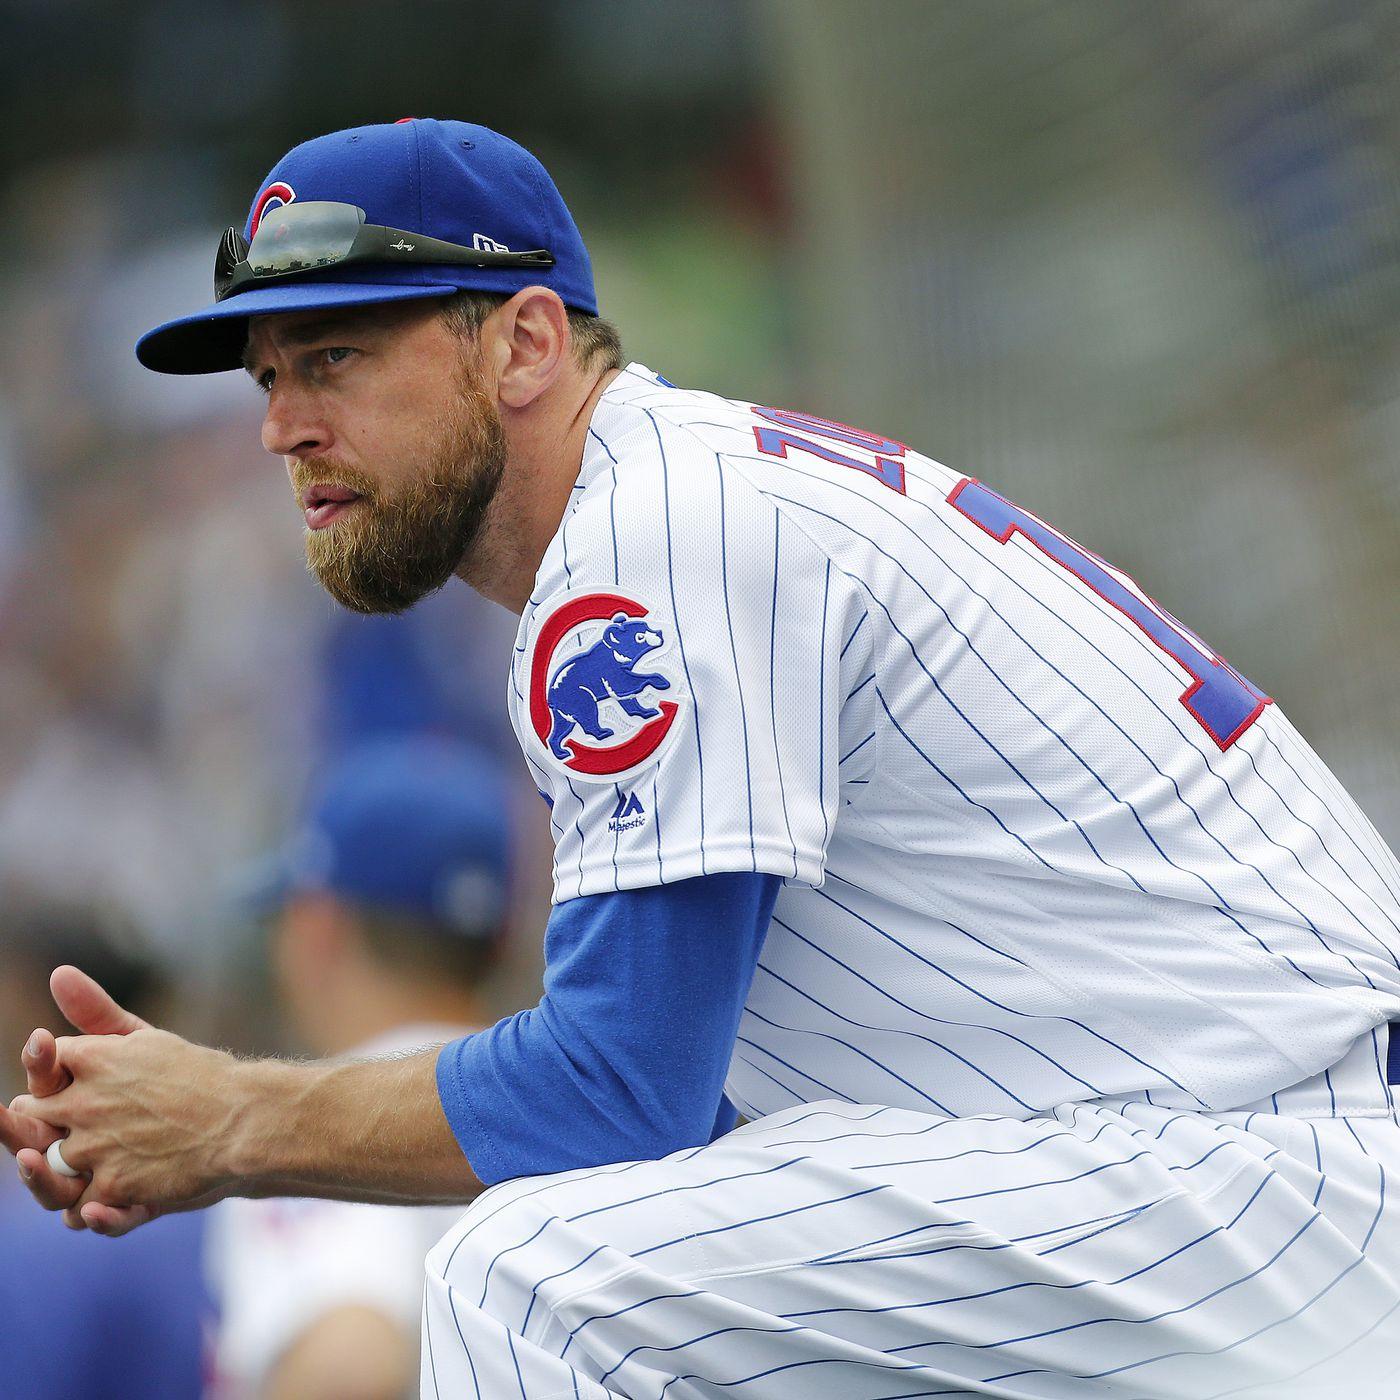 Should the Cubs re-sign Ben Zobrist? - Bleed Cubbie Blue